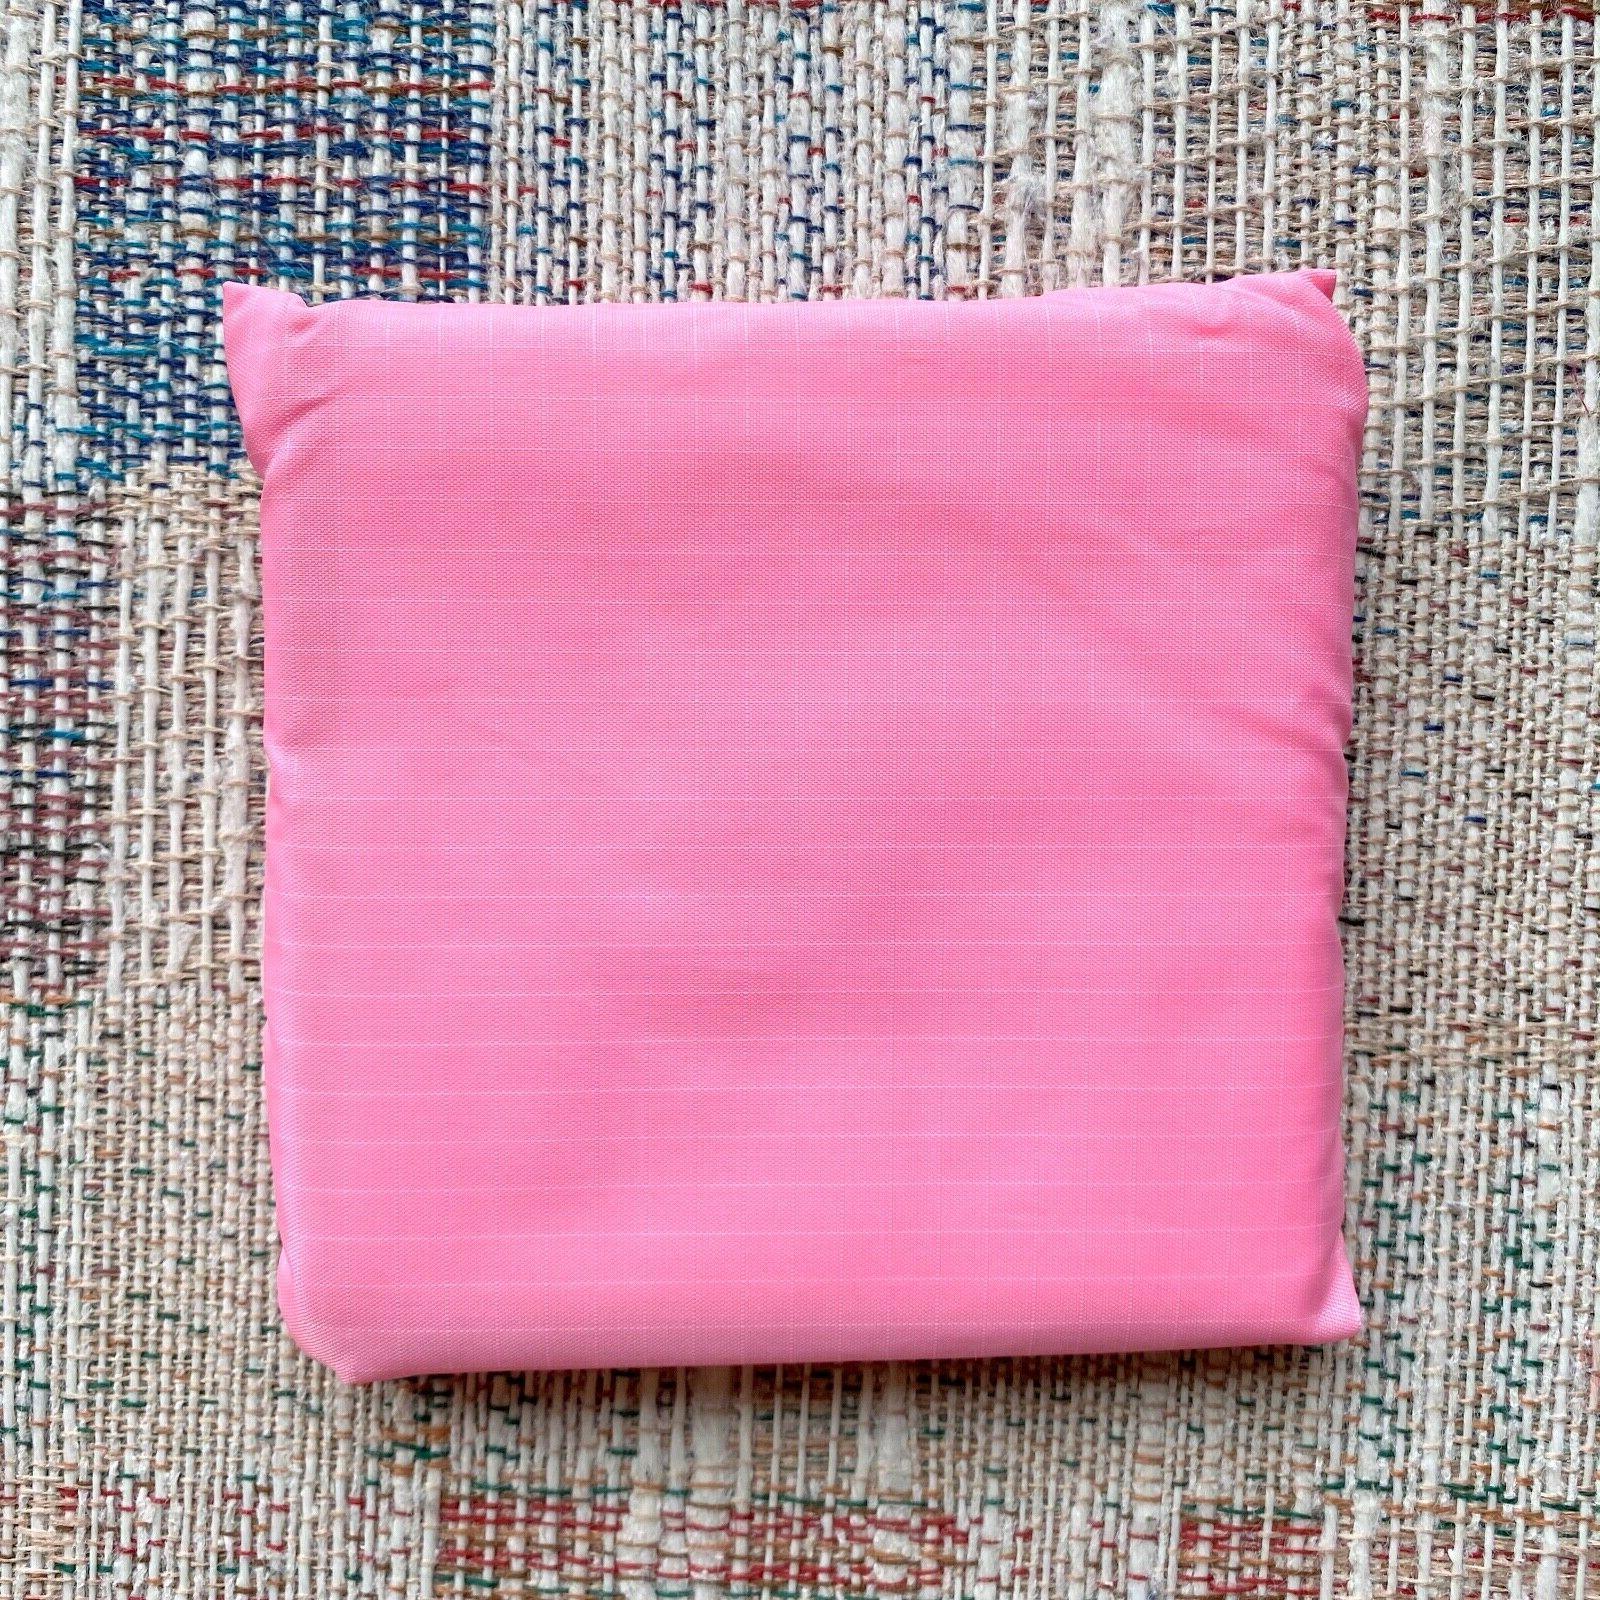 Baggu - Solid Color - Grocery Tote Bag